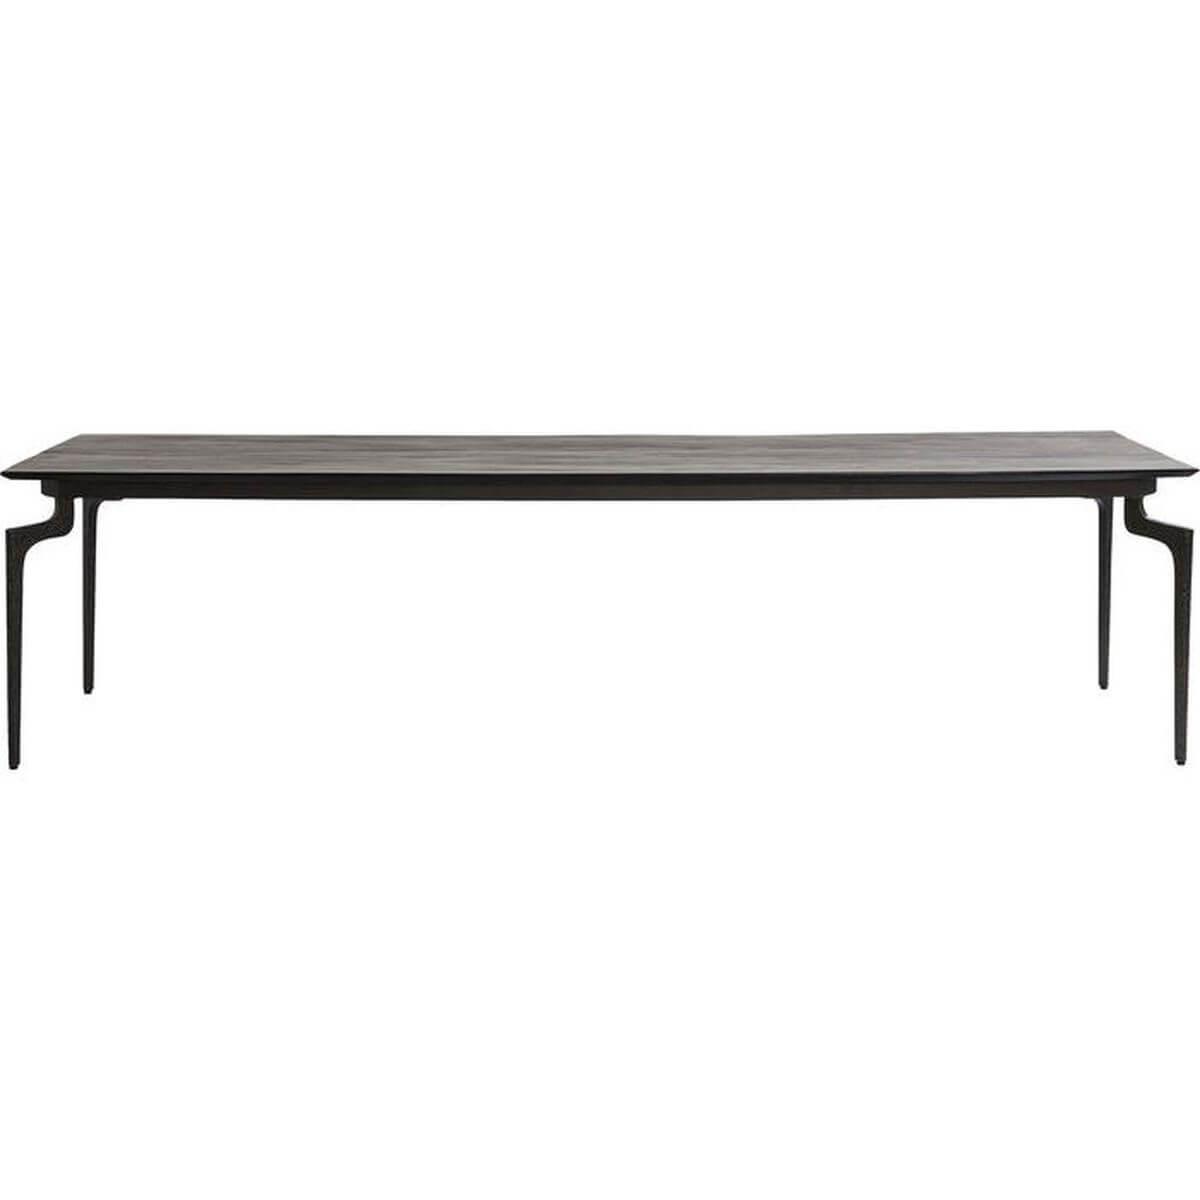 Table BUG Kare Design 200cm